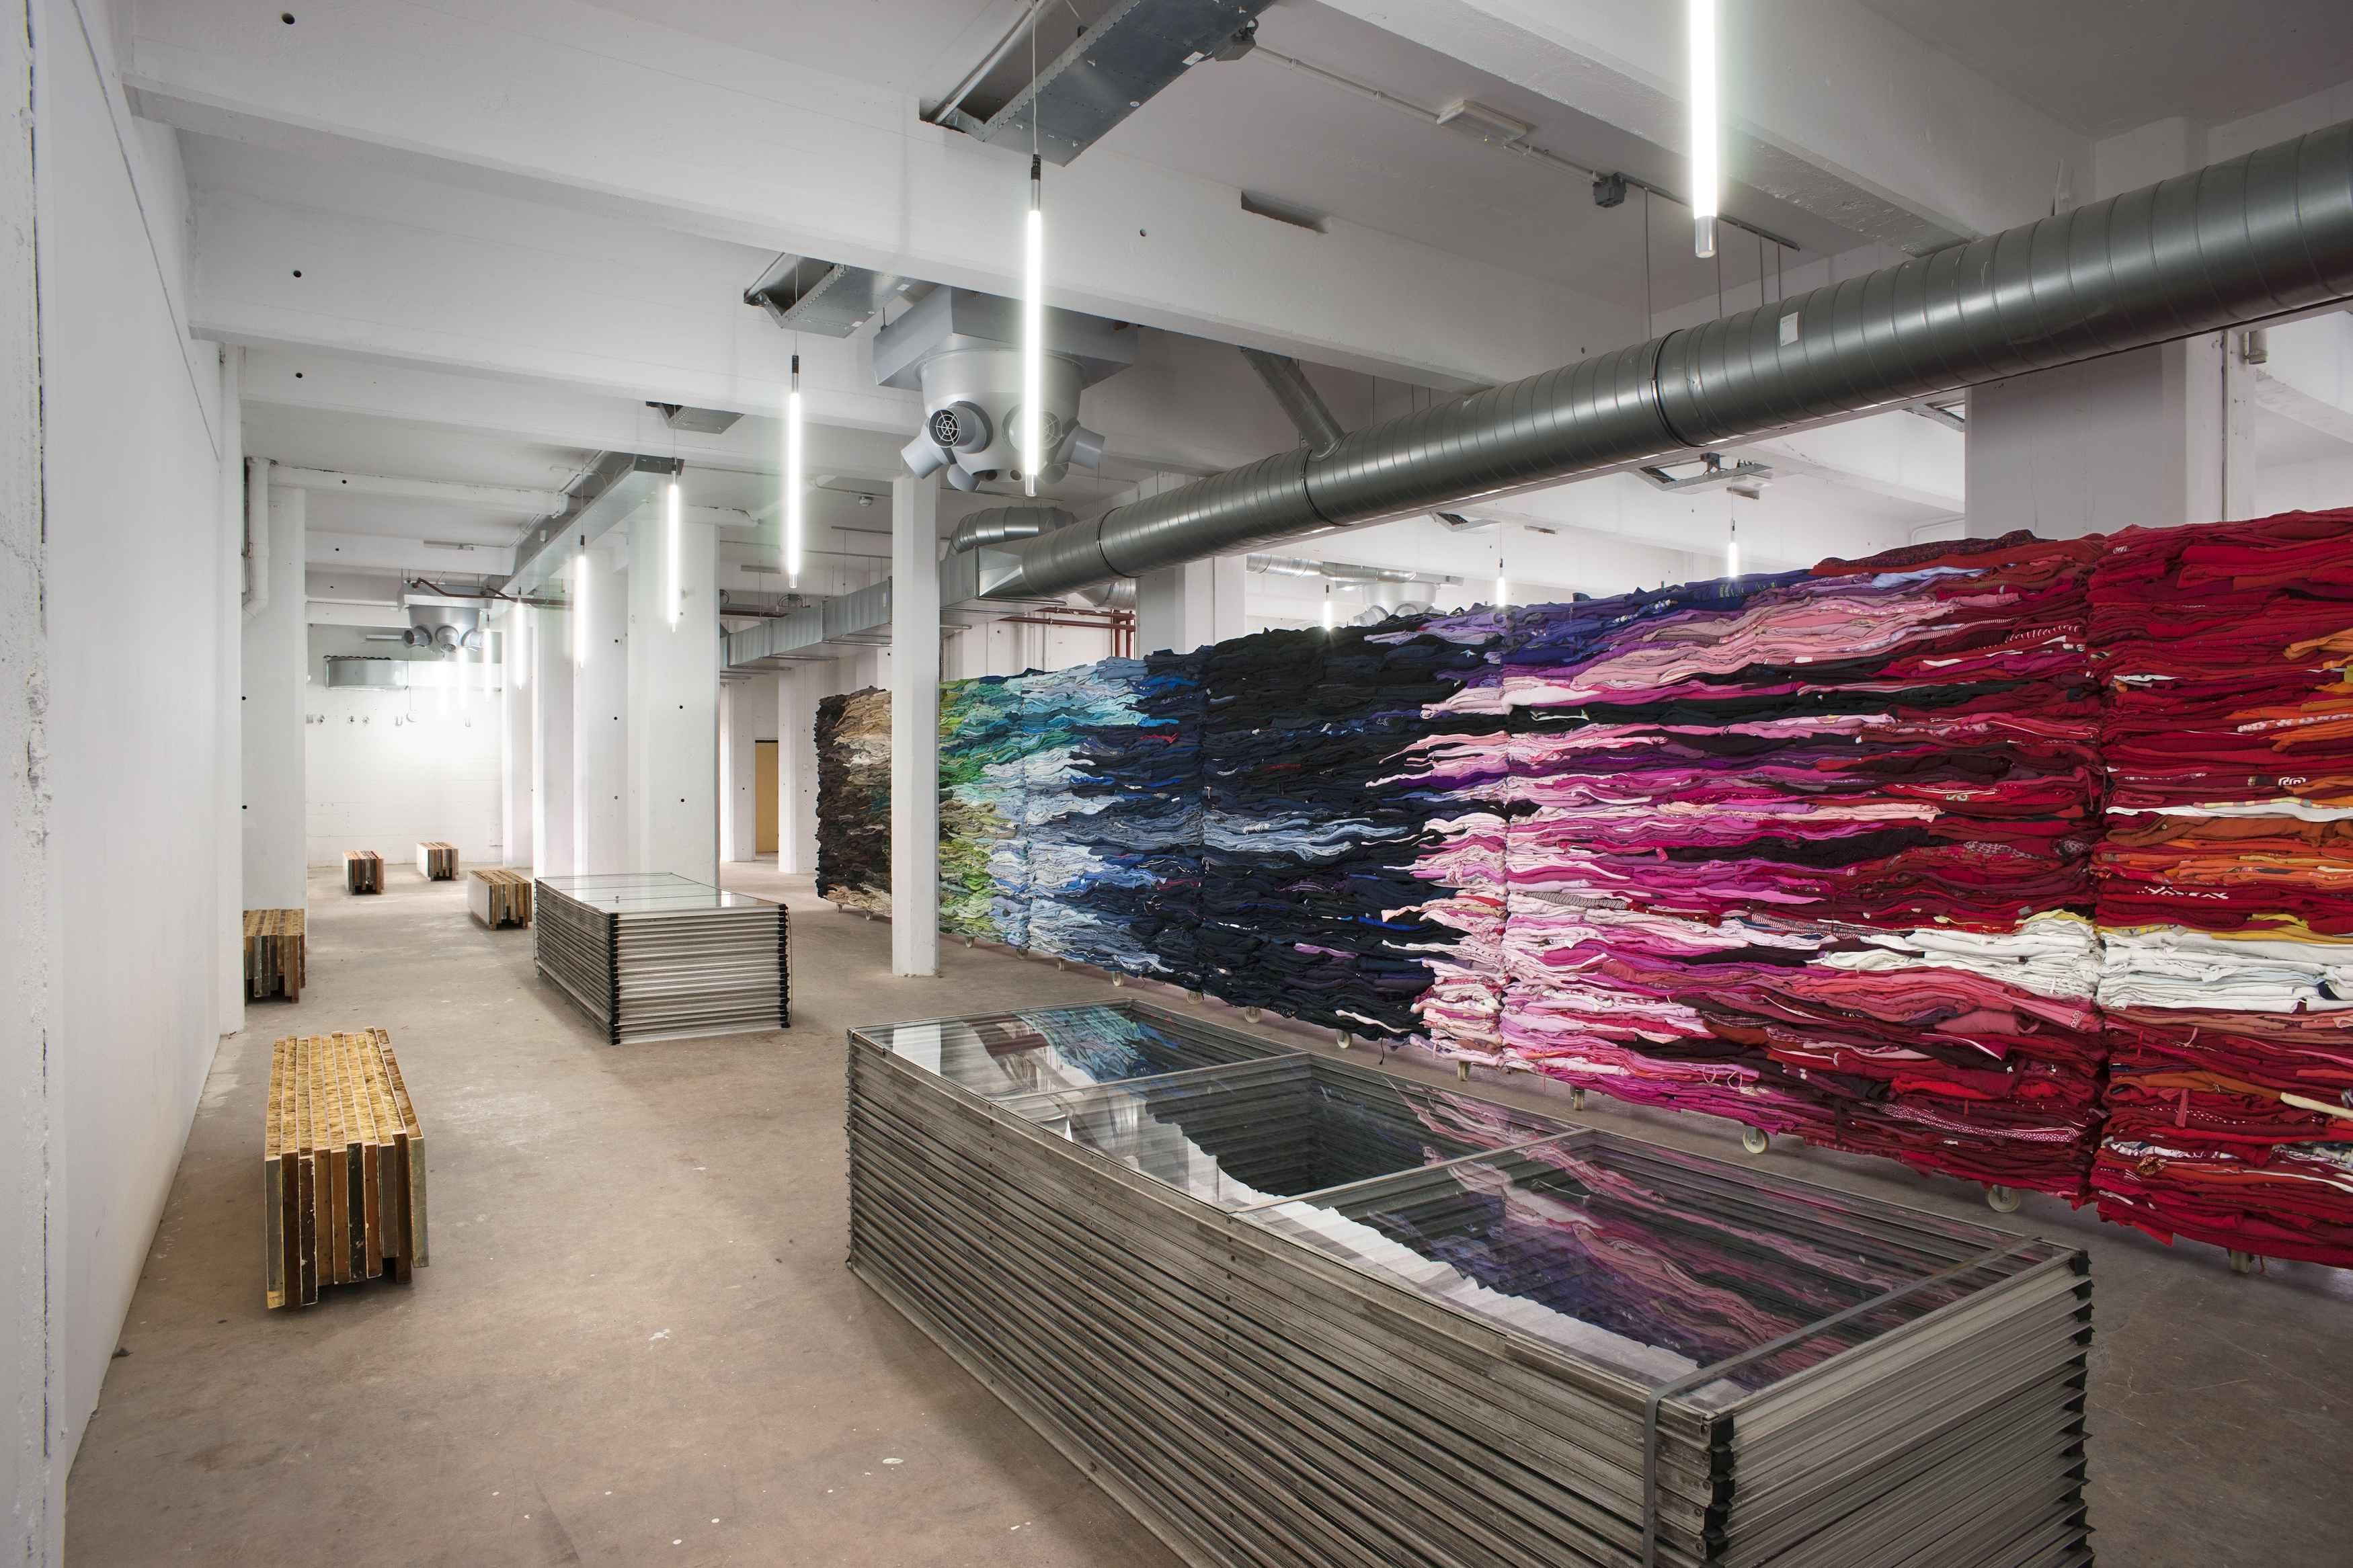 Sloopmateriaal wordt kantoorinterieur for Archi interieur rotterdam